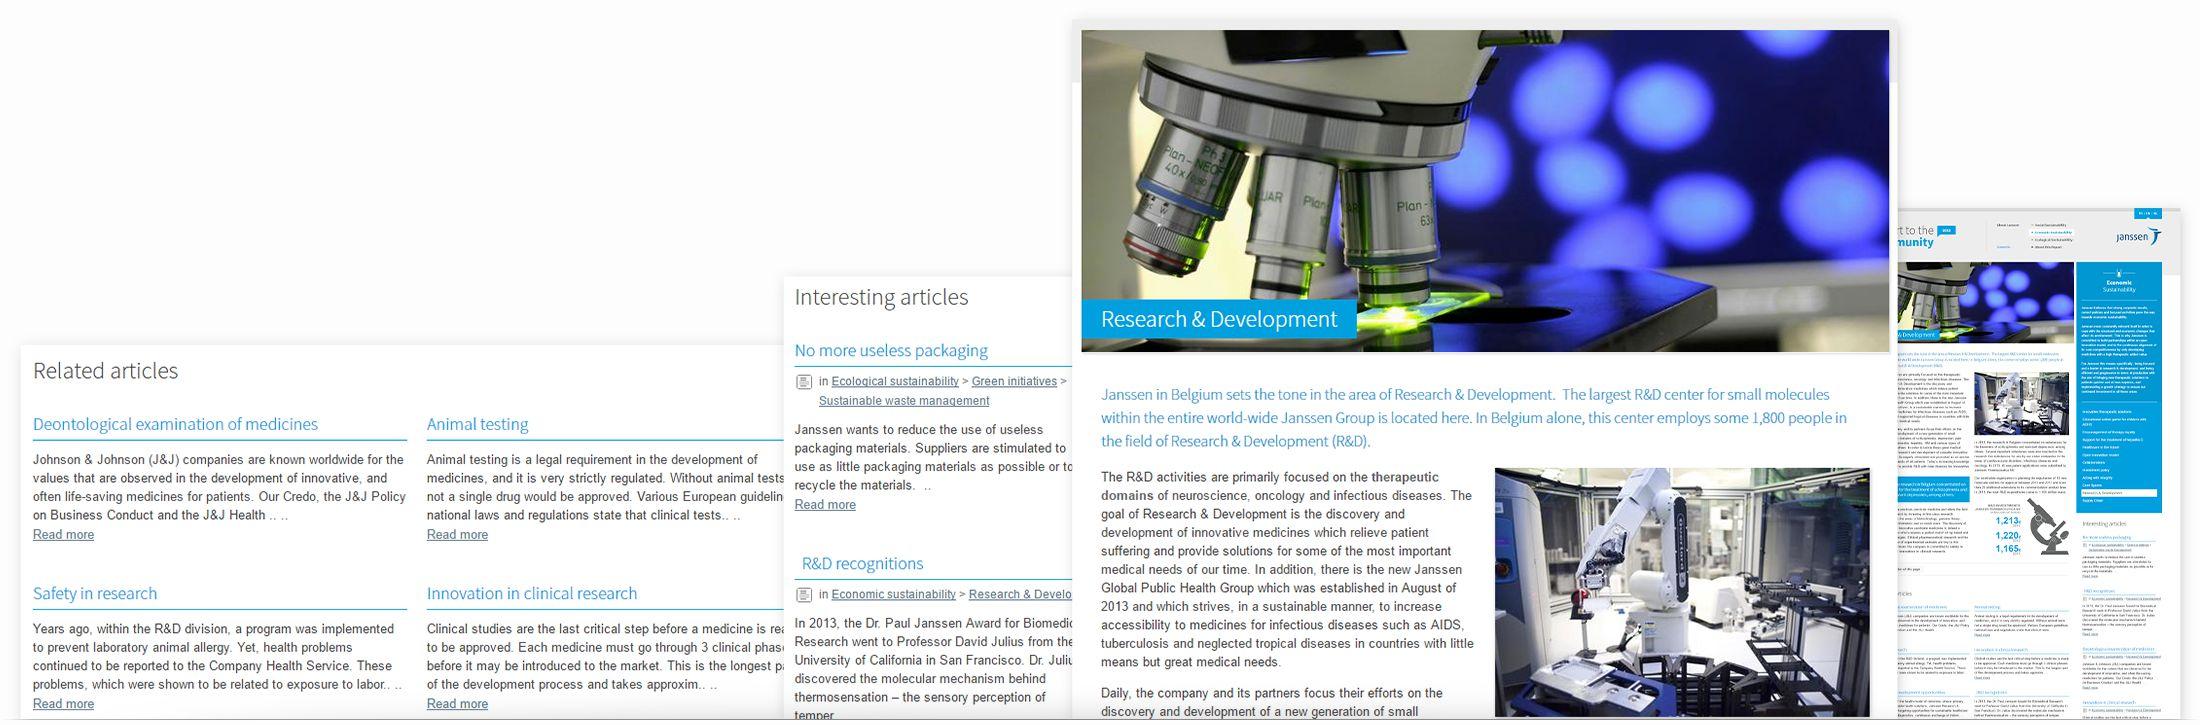 Janssen 2013 - page structure